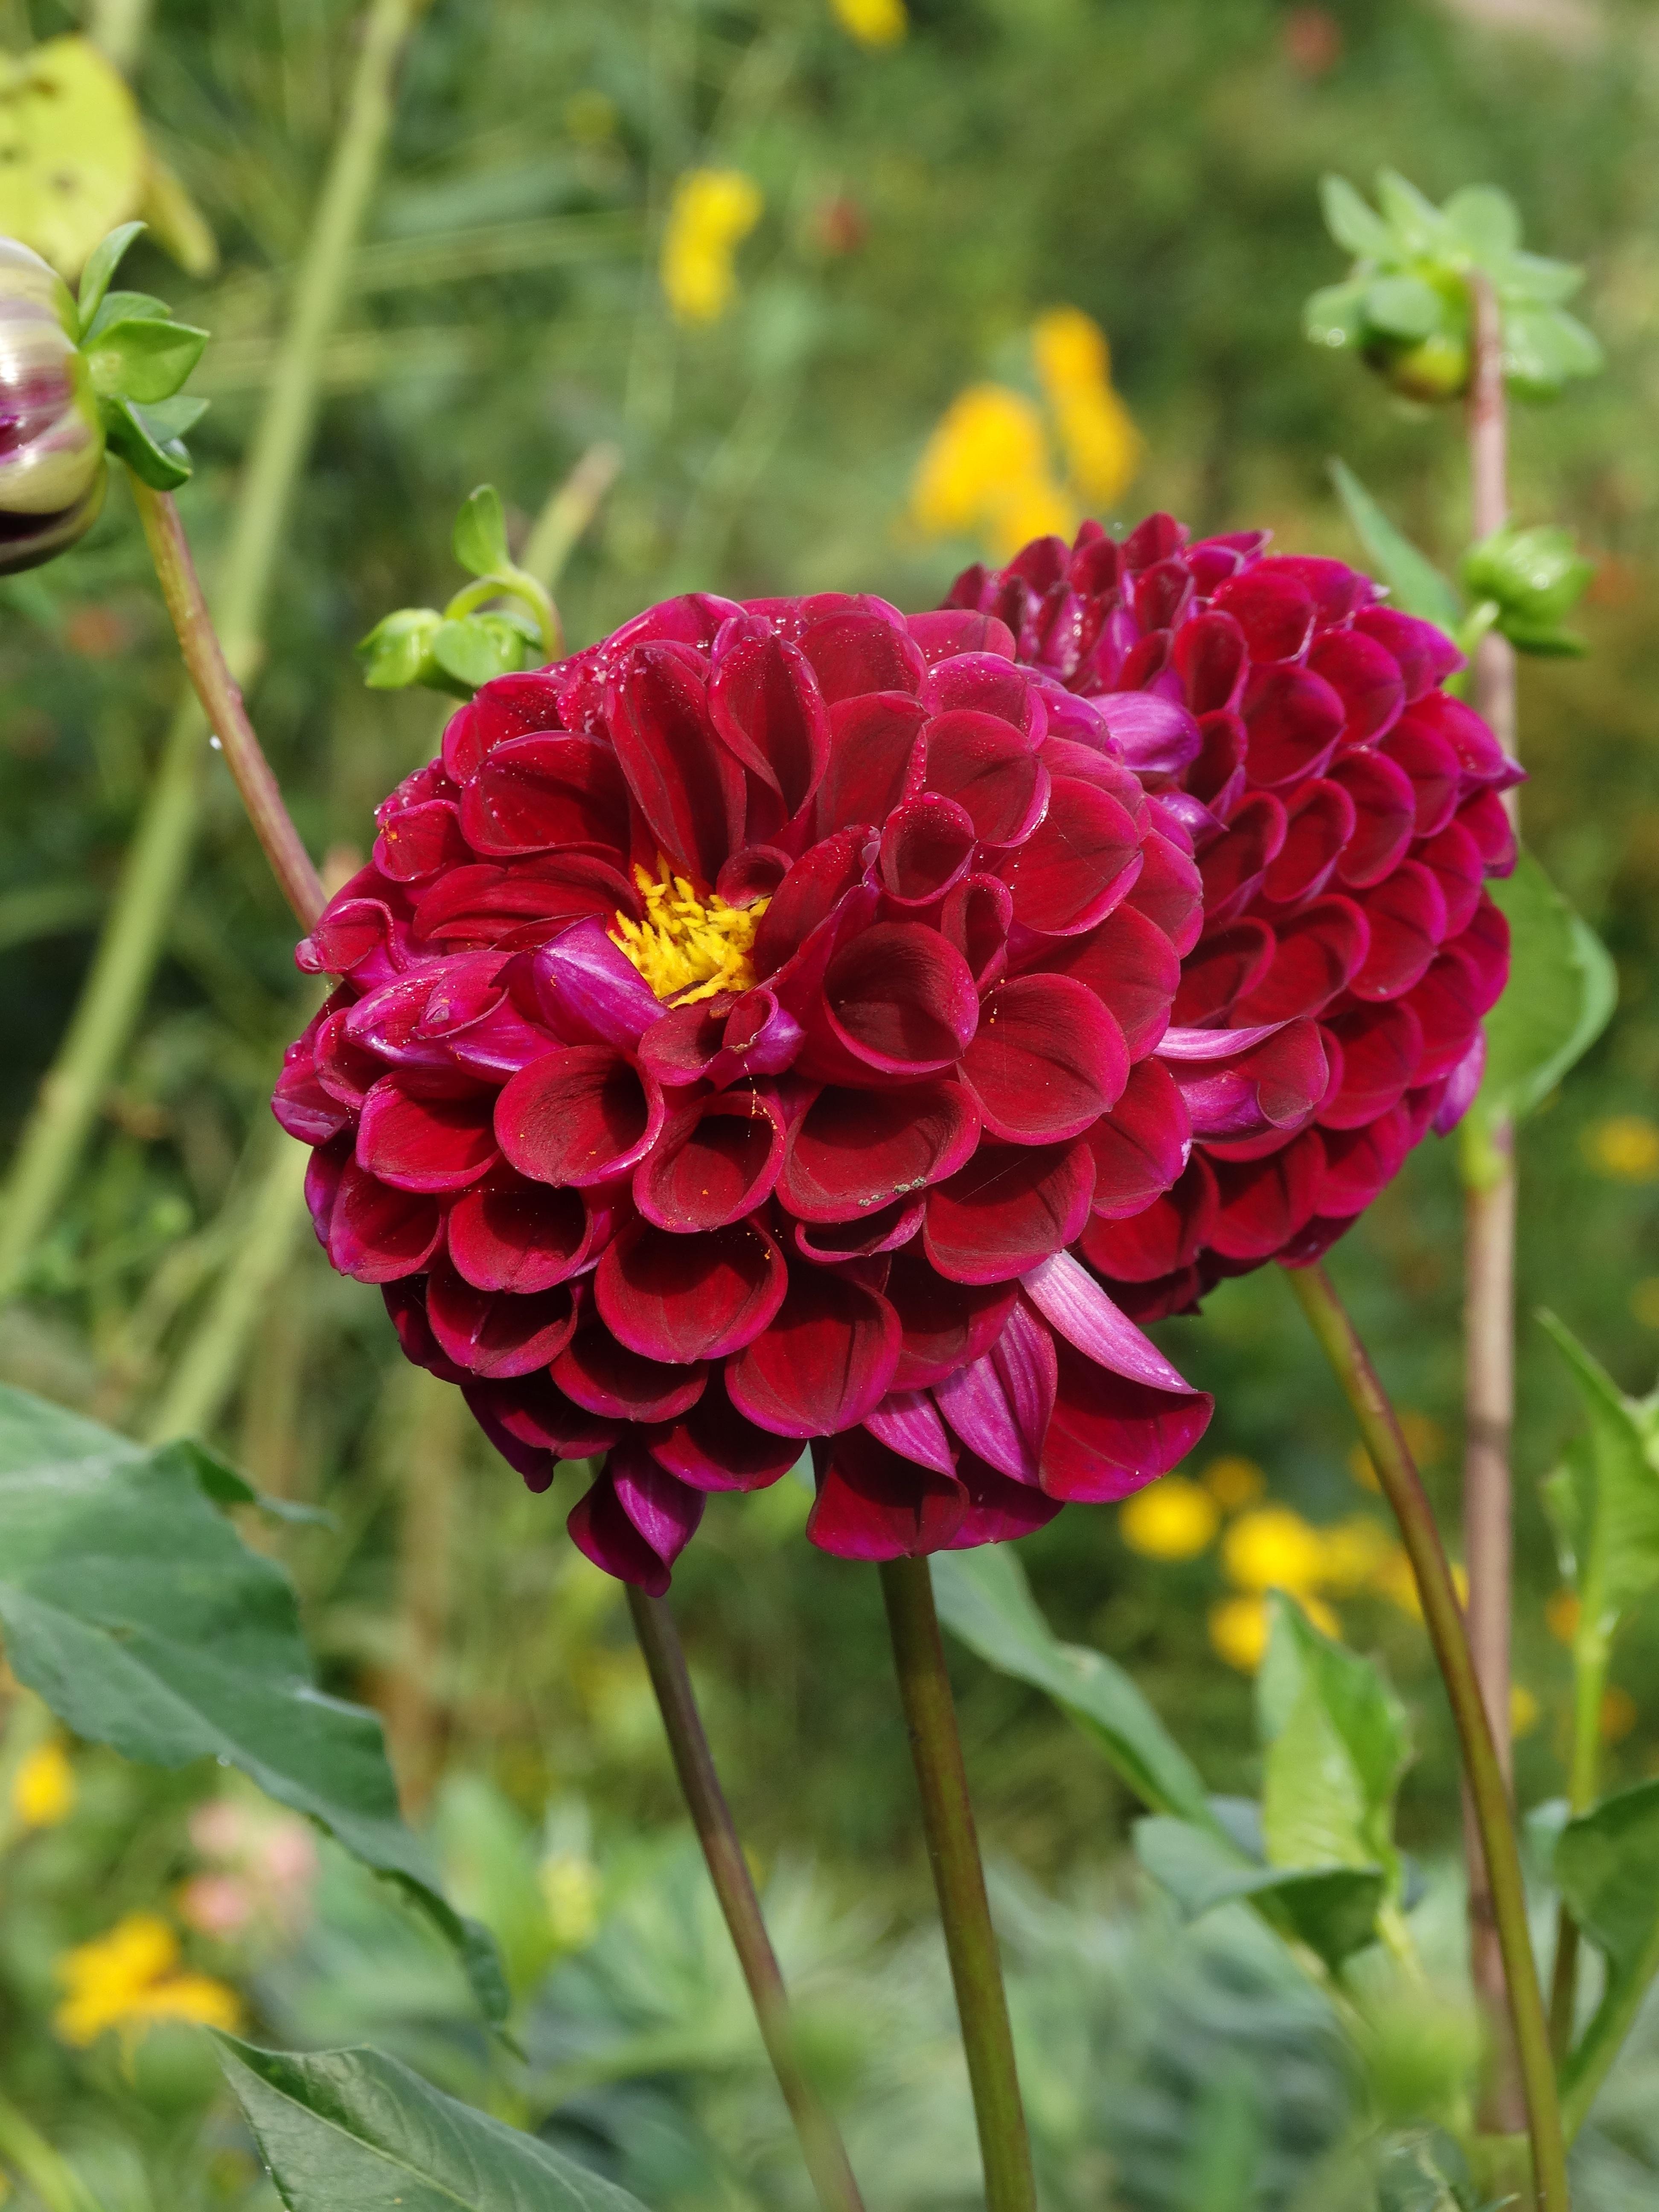 Free Images Field Flower Petal Botany Garden Flora